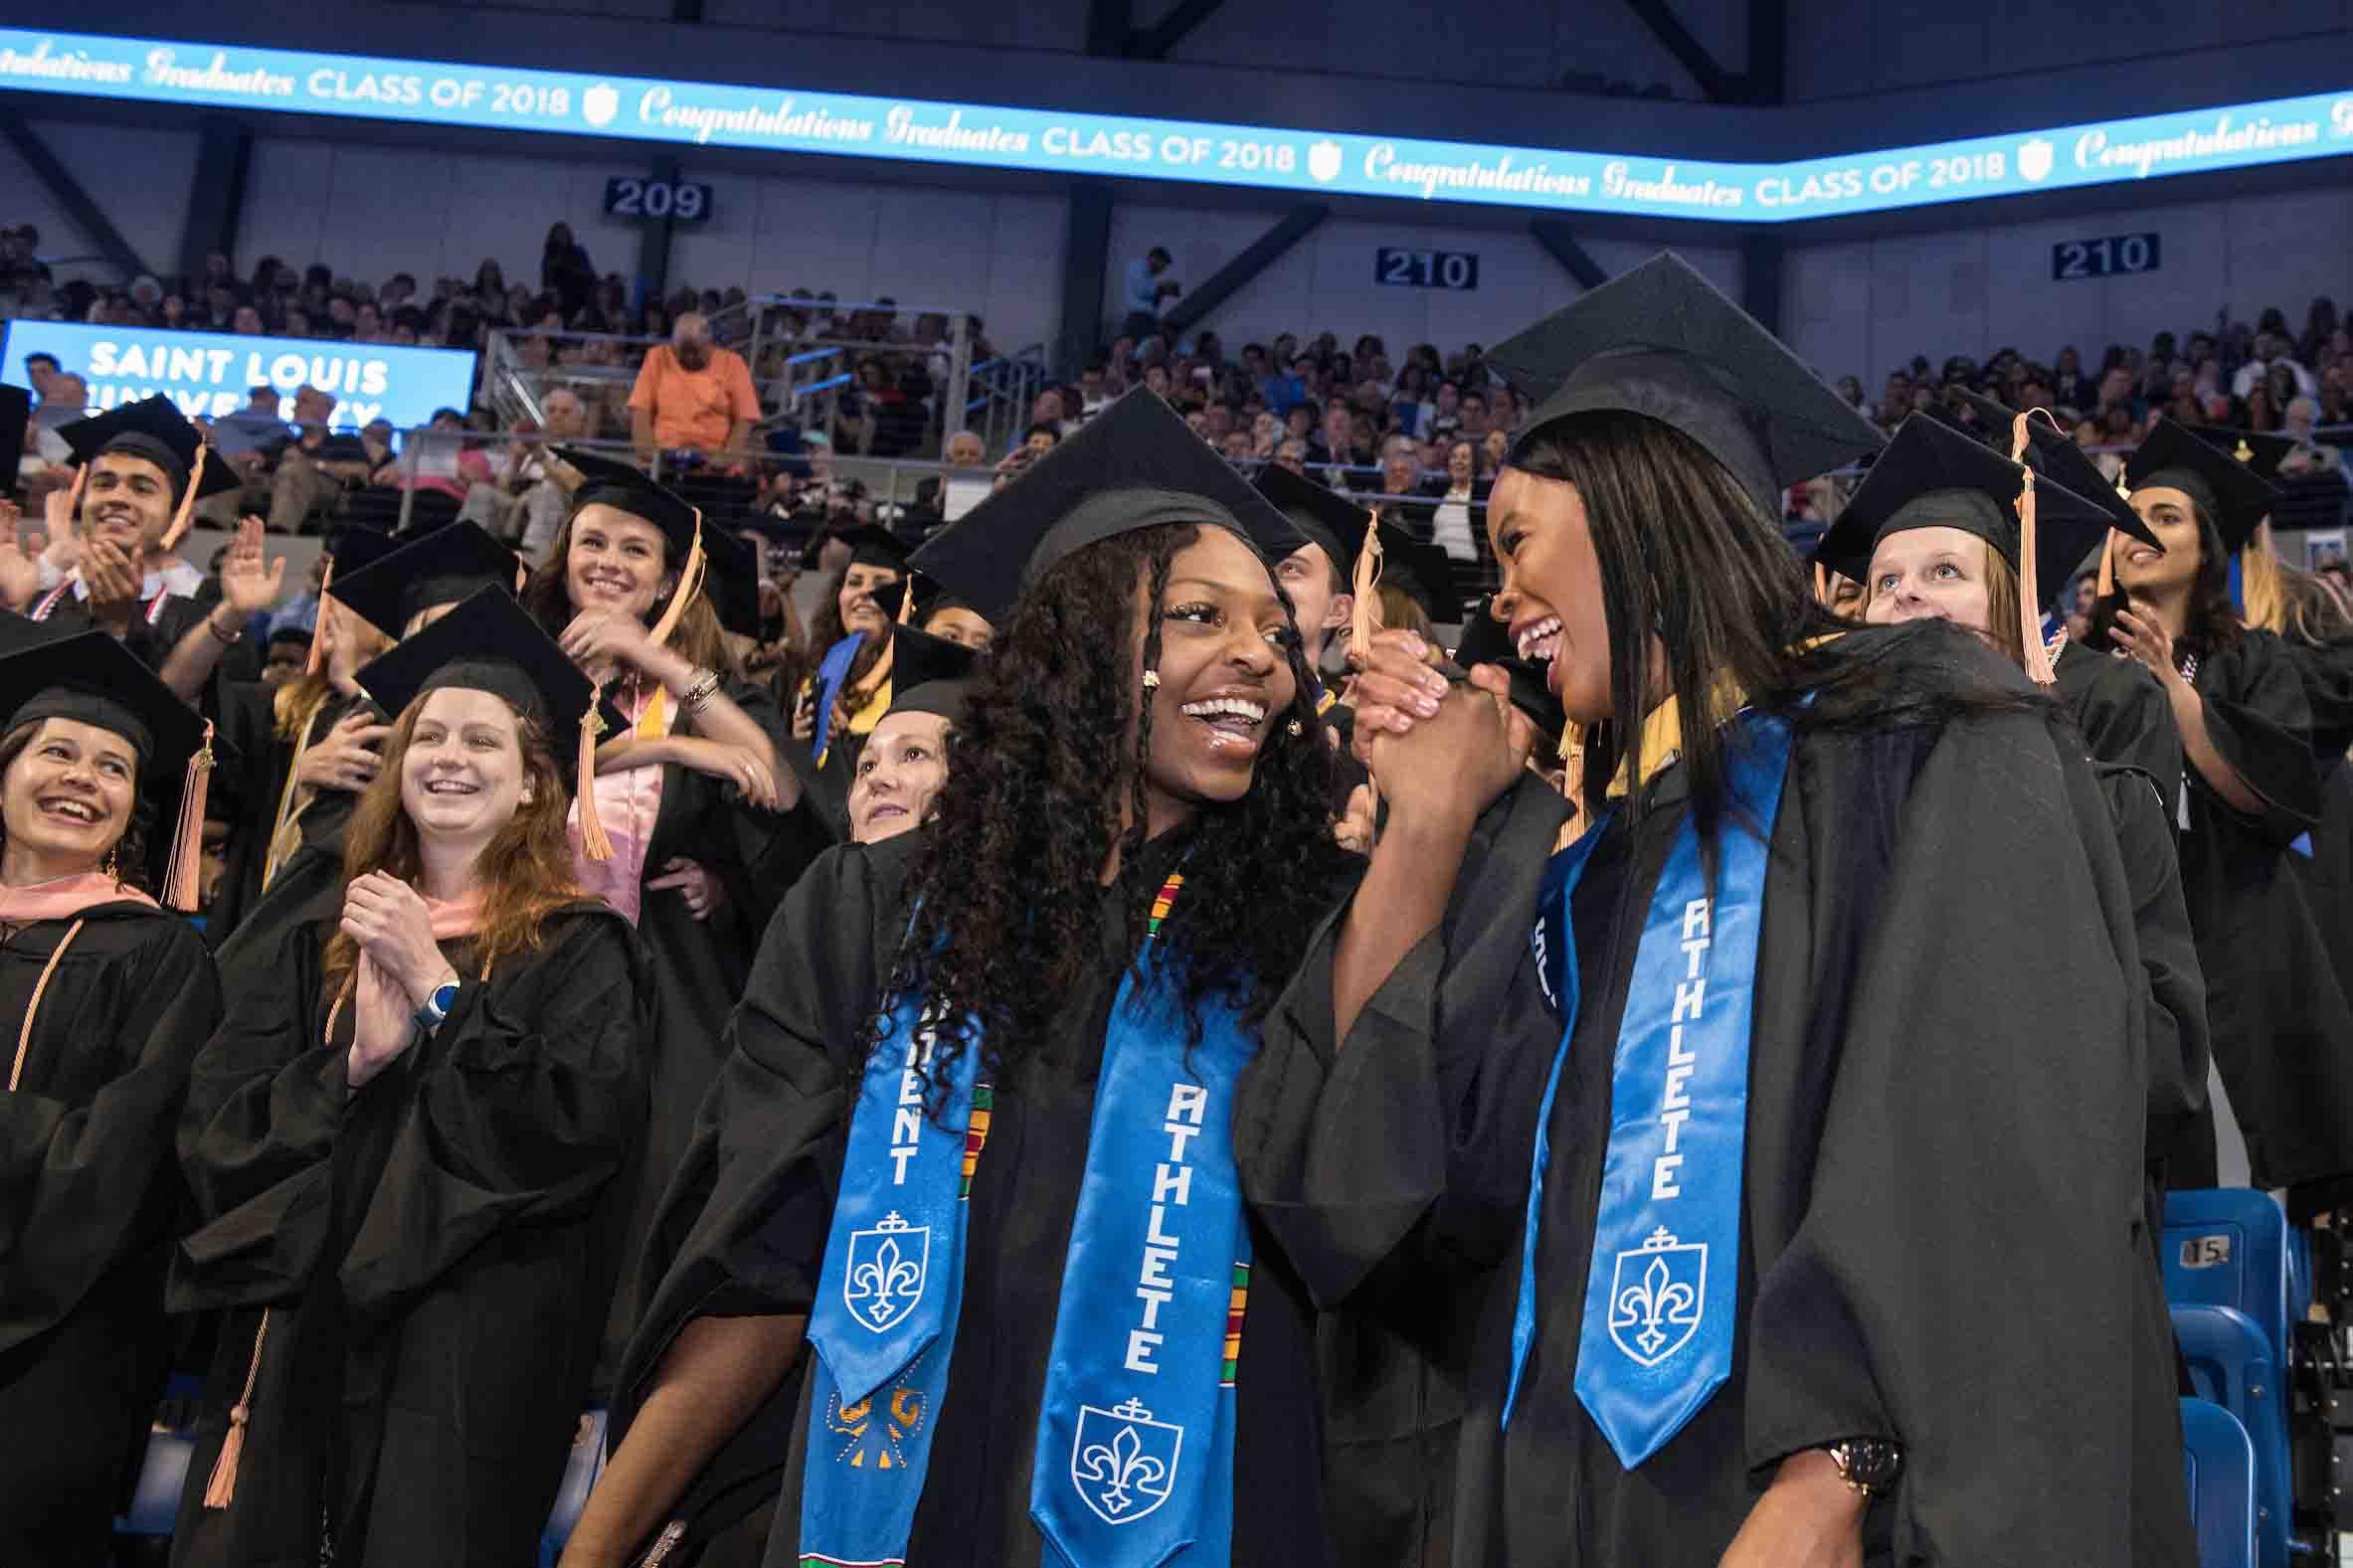 Slu Graduation 2020.2019 Commencement What You Need To Know Slu